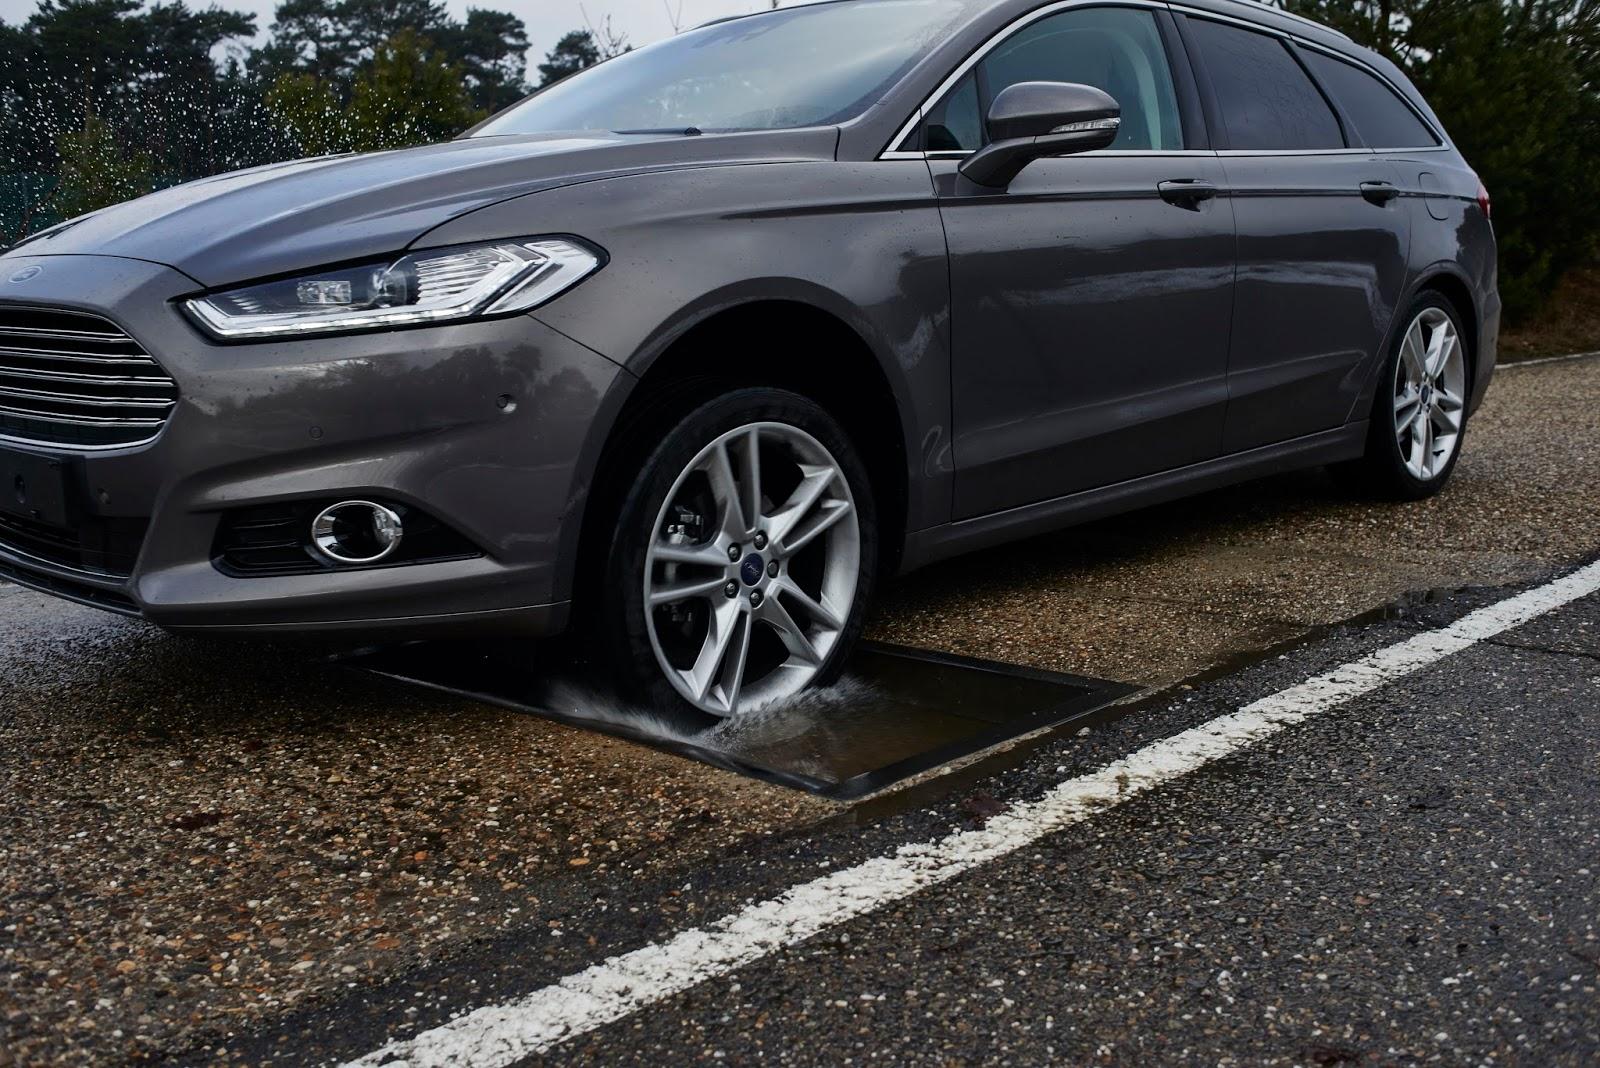 FORD2017 Pothole 5 Η Ford χαρτογραφεί τις λακκούβες Ford, Innovation, τεχνικά, Τεχνολογία